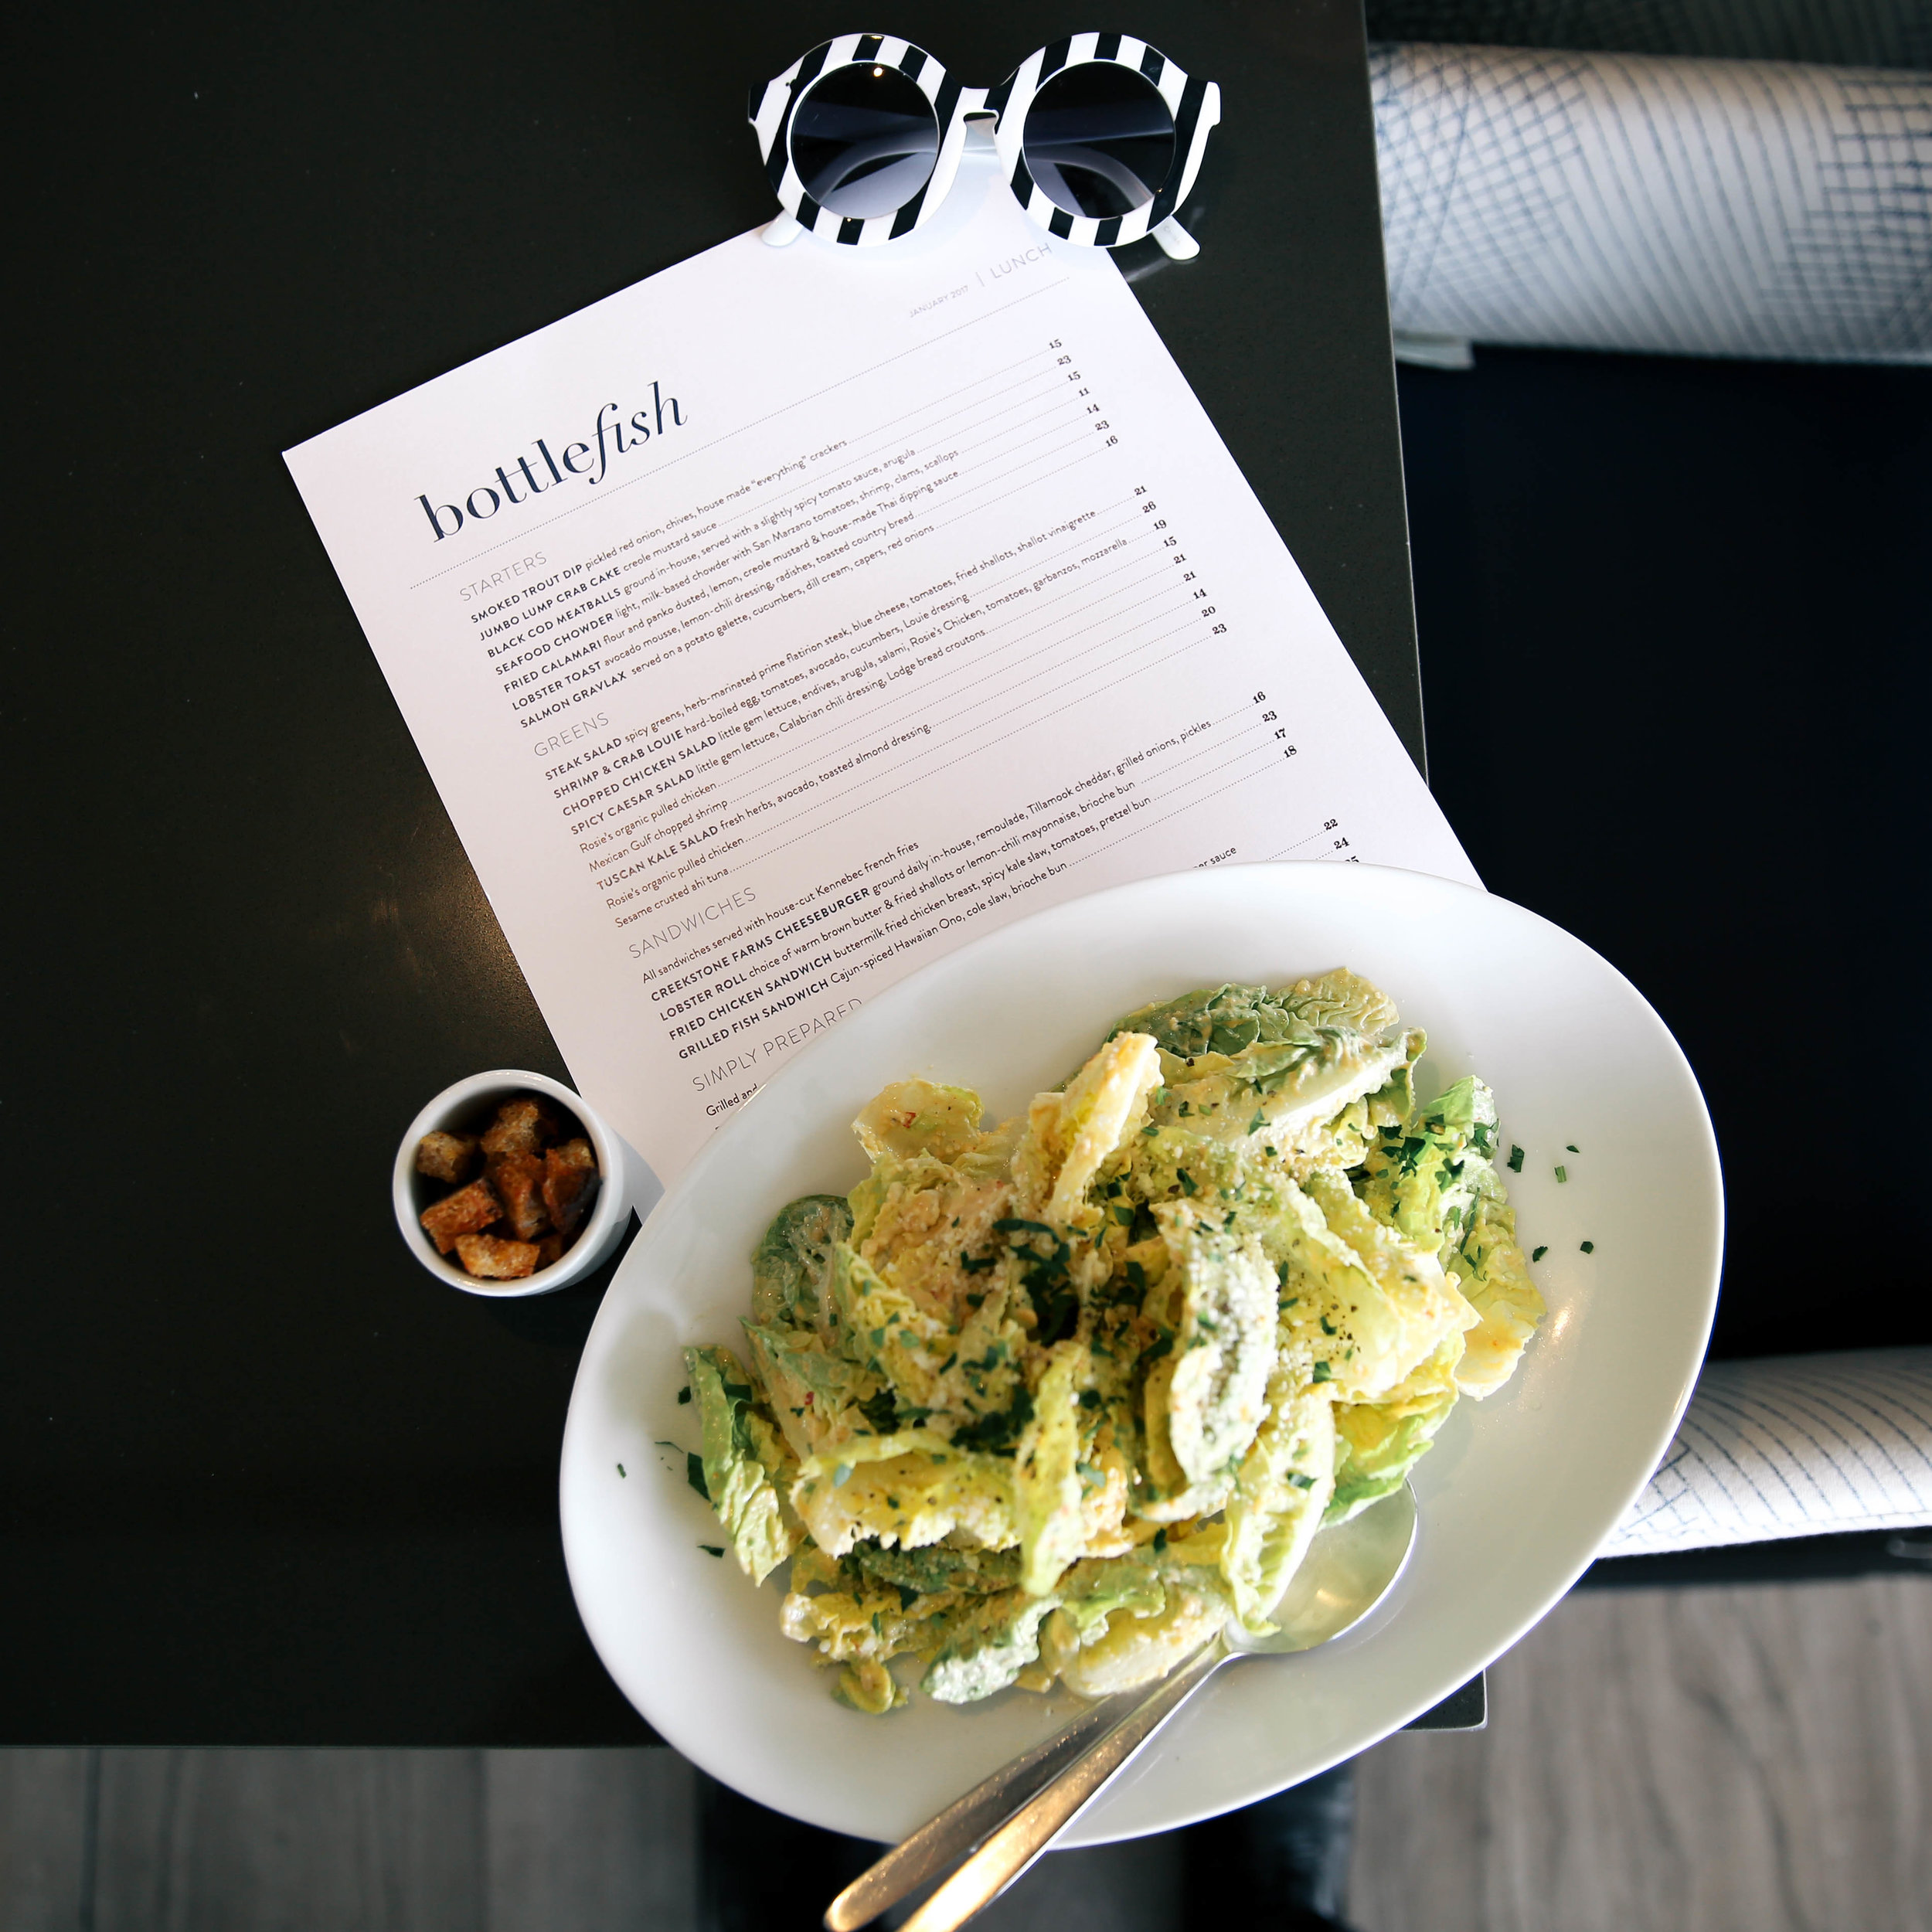 Bottlefish Los Angeles menu spicy caesar salad The Style Sauce blog